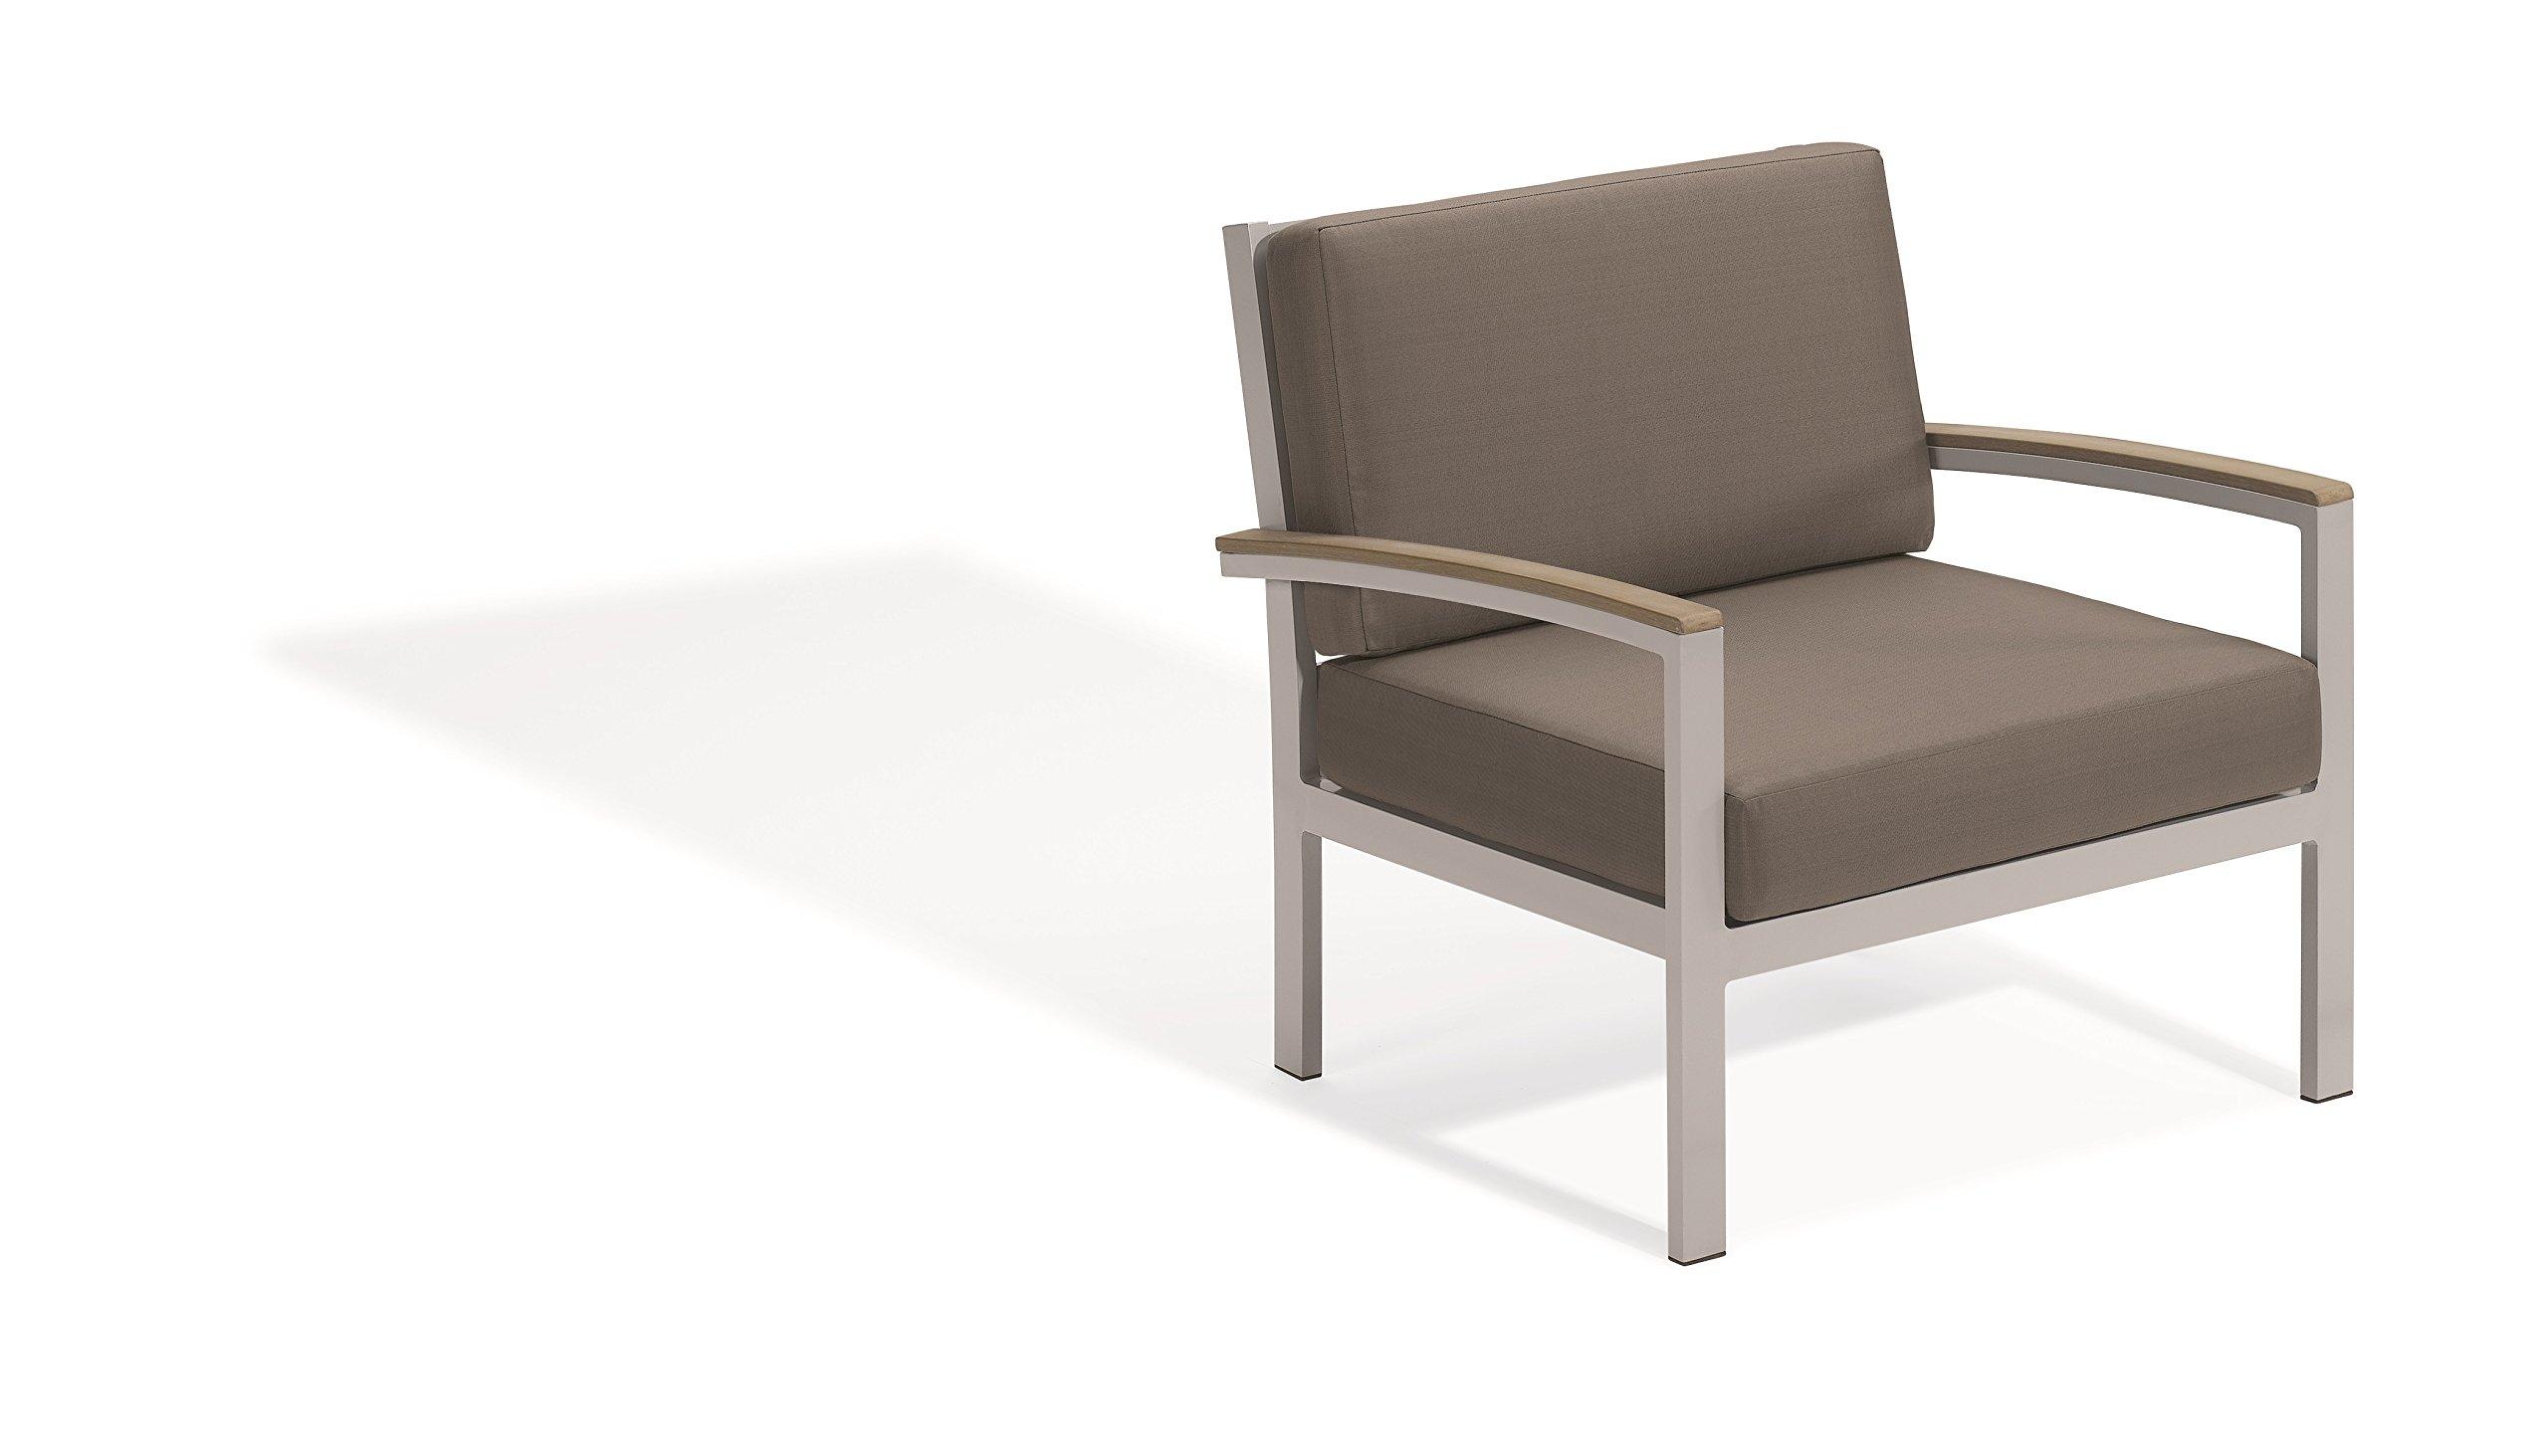 Oxford Garden Travira Club Chair - Powder Coated Aluminum Frame - Stone Cushion - Vintage Tekwood Armcaps